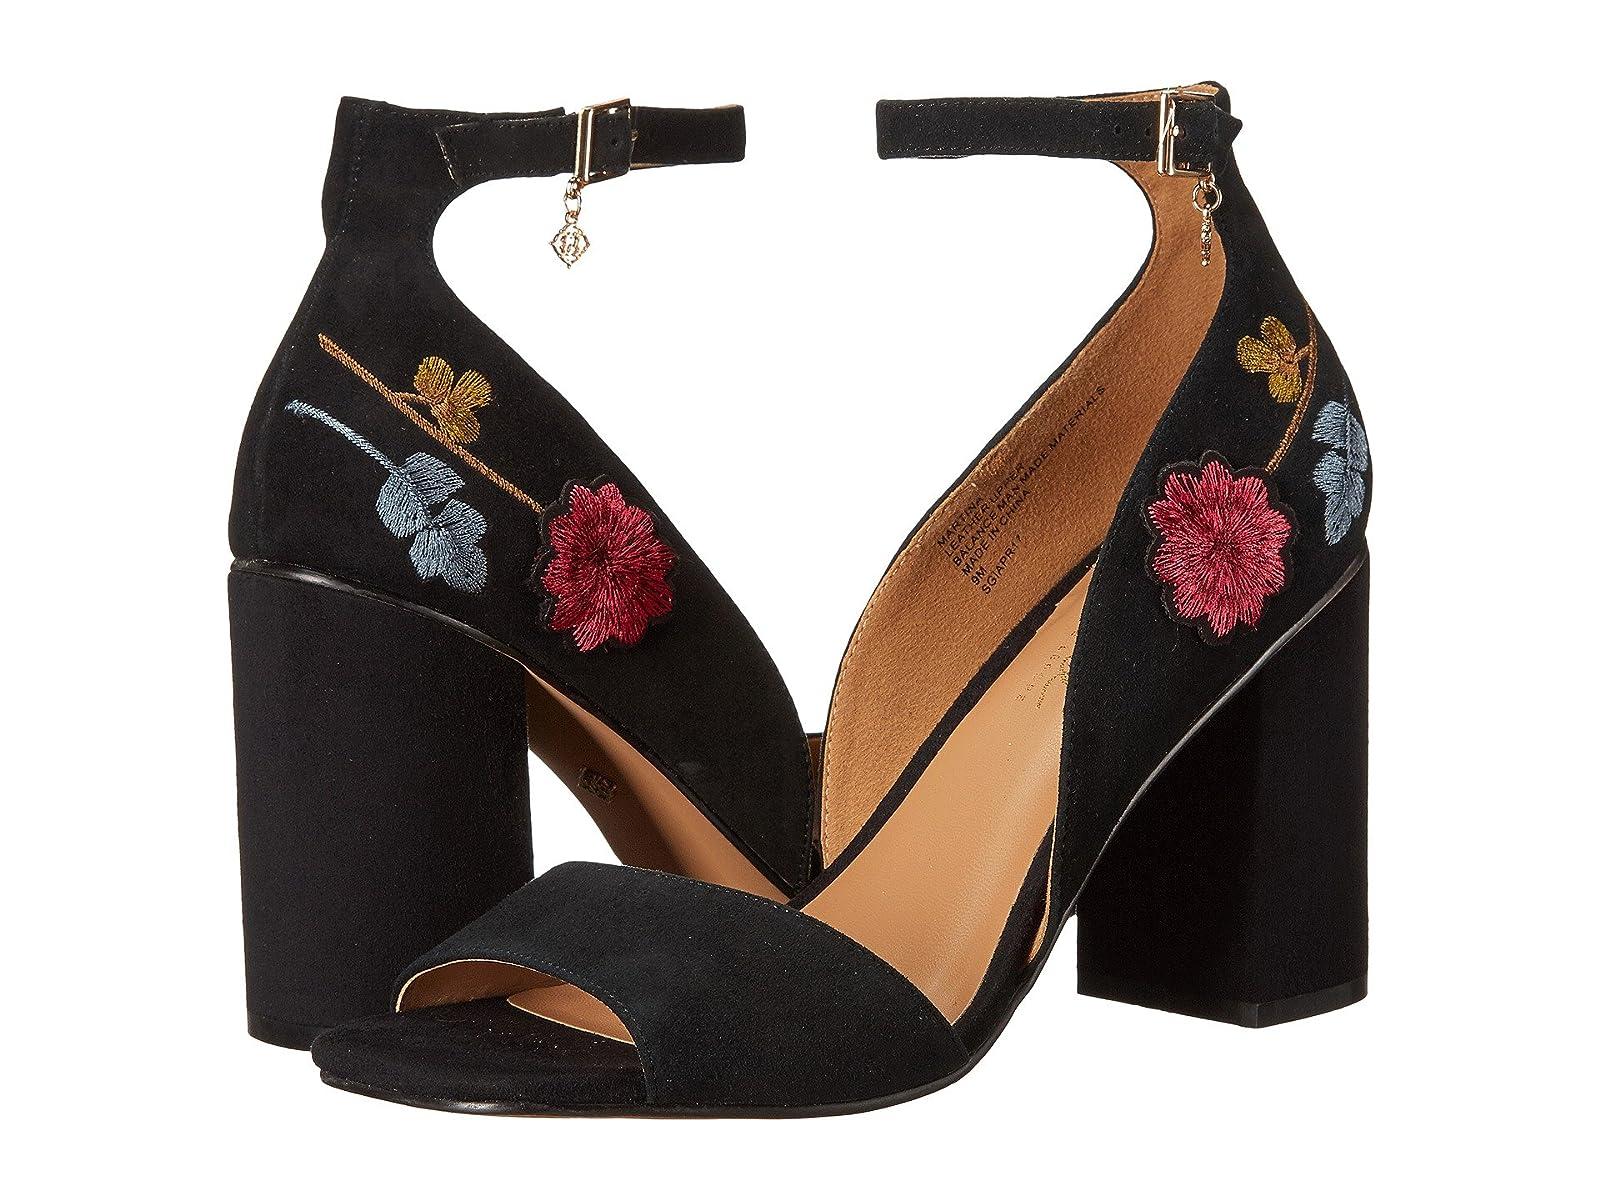 Nanette nanette lepore MartinaCheap and distinctive eye-catching shoes